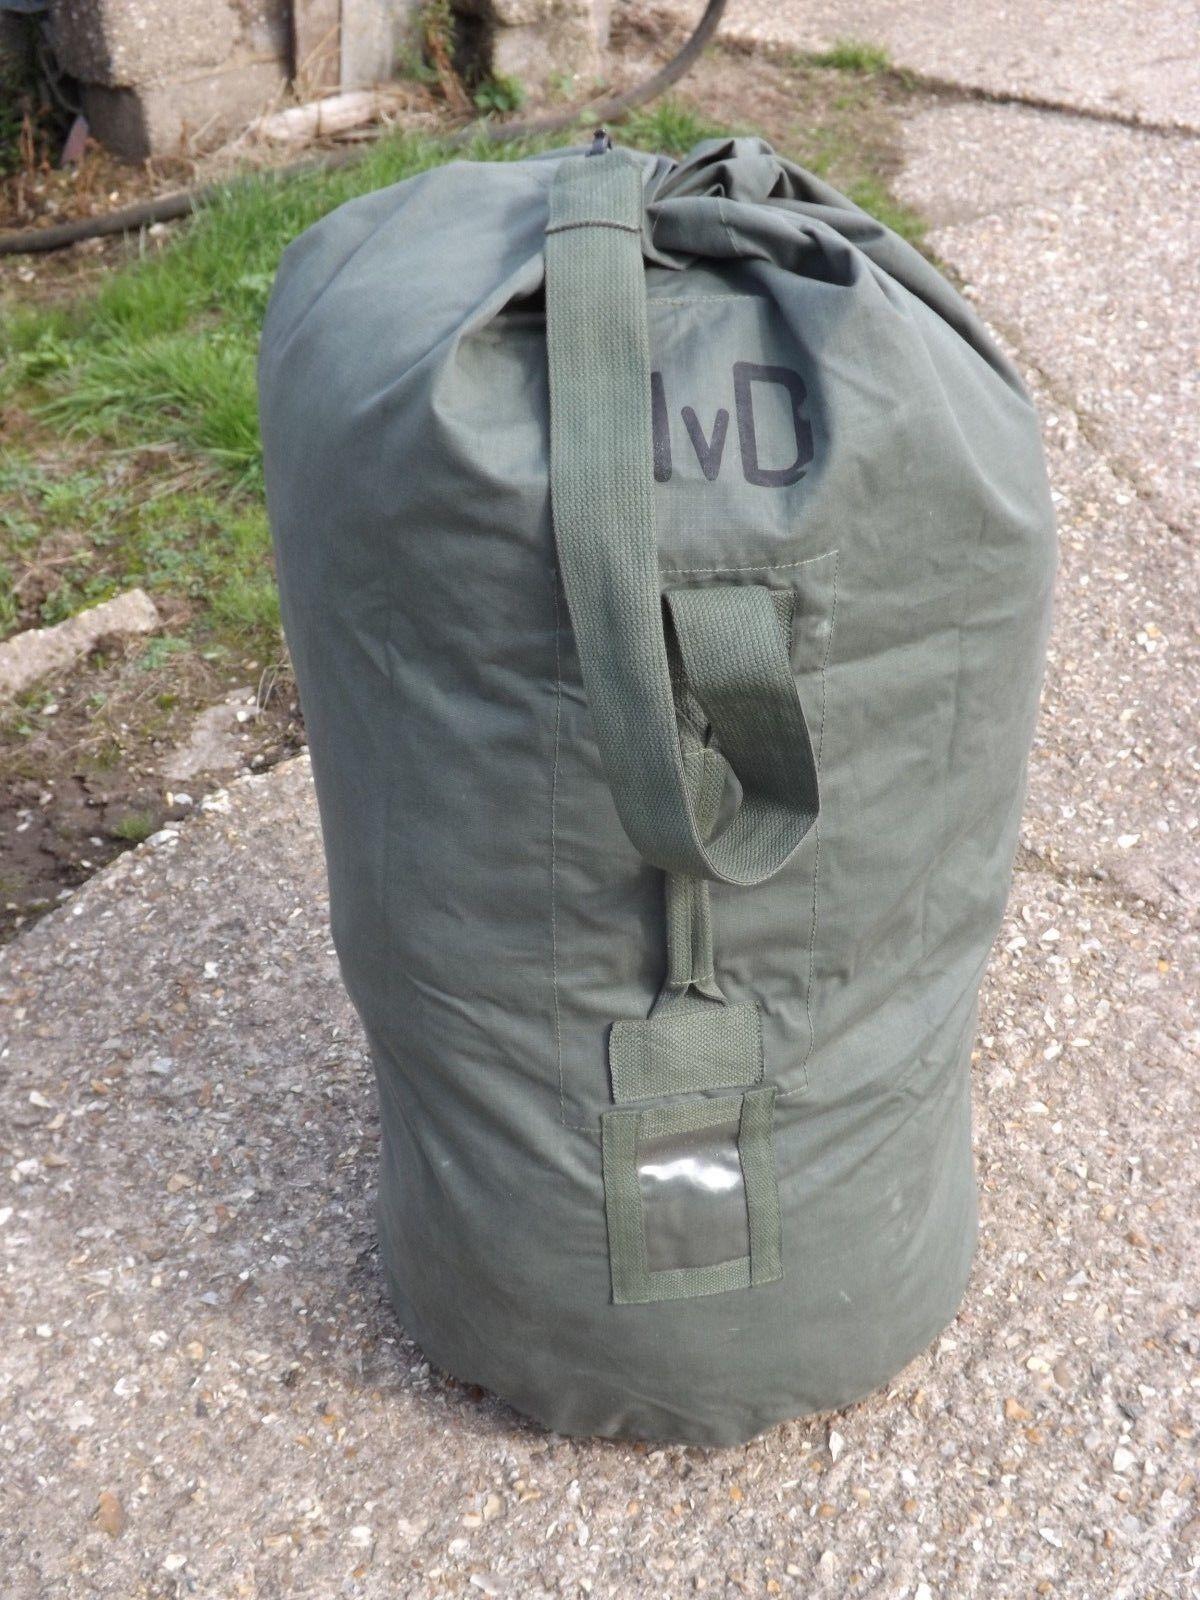 459bc812611 Genuine Dutch Extra Large Kit Bag Cotton Canvas Military Bag Rucksack  Holdall